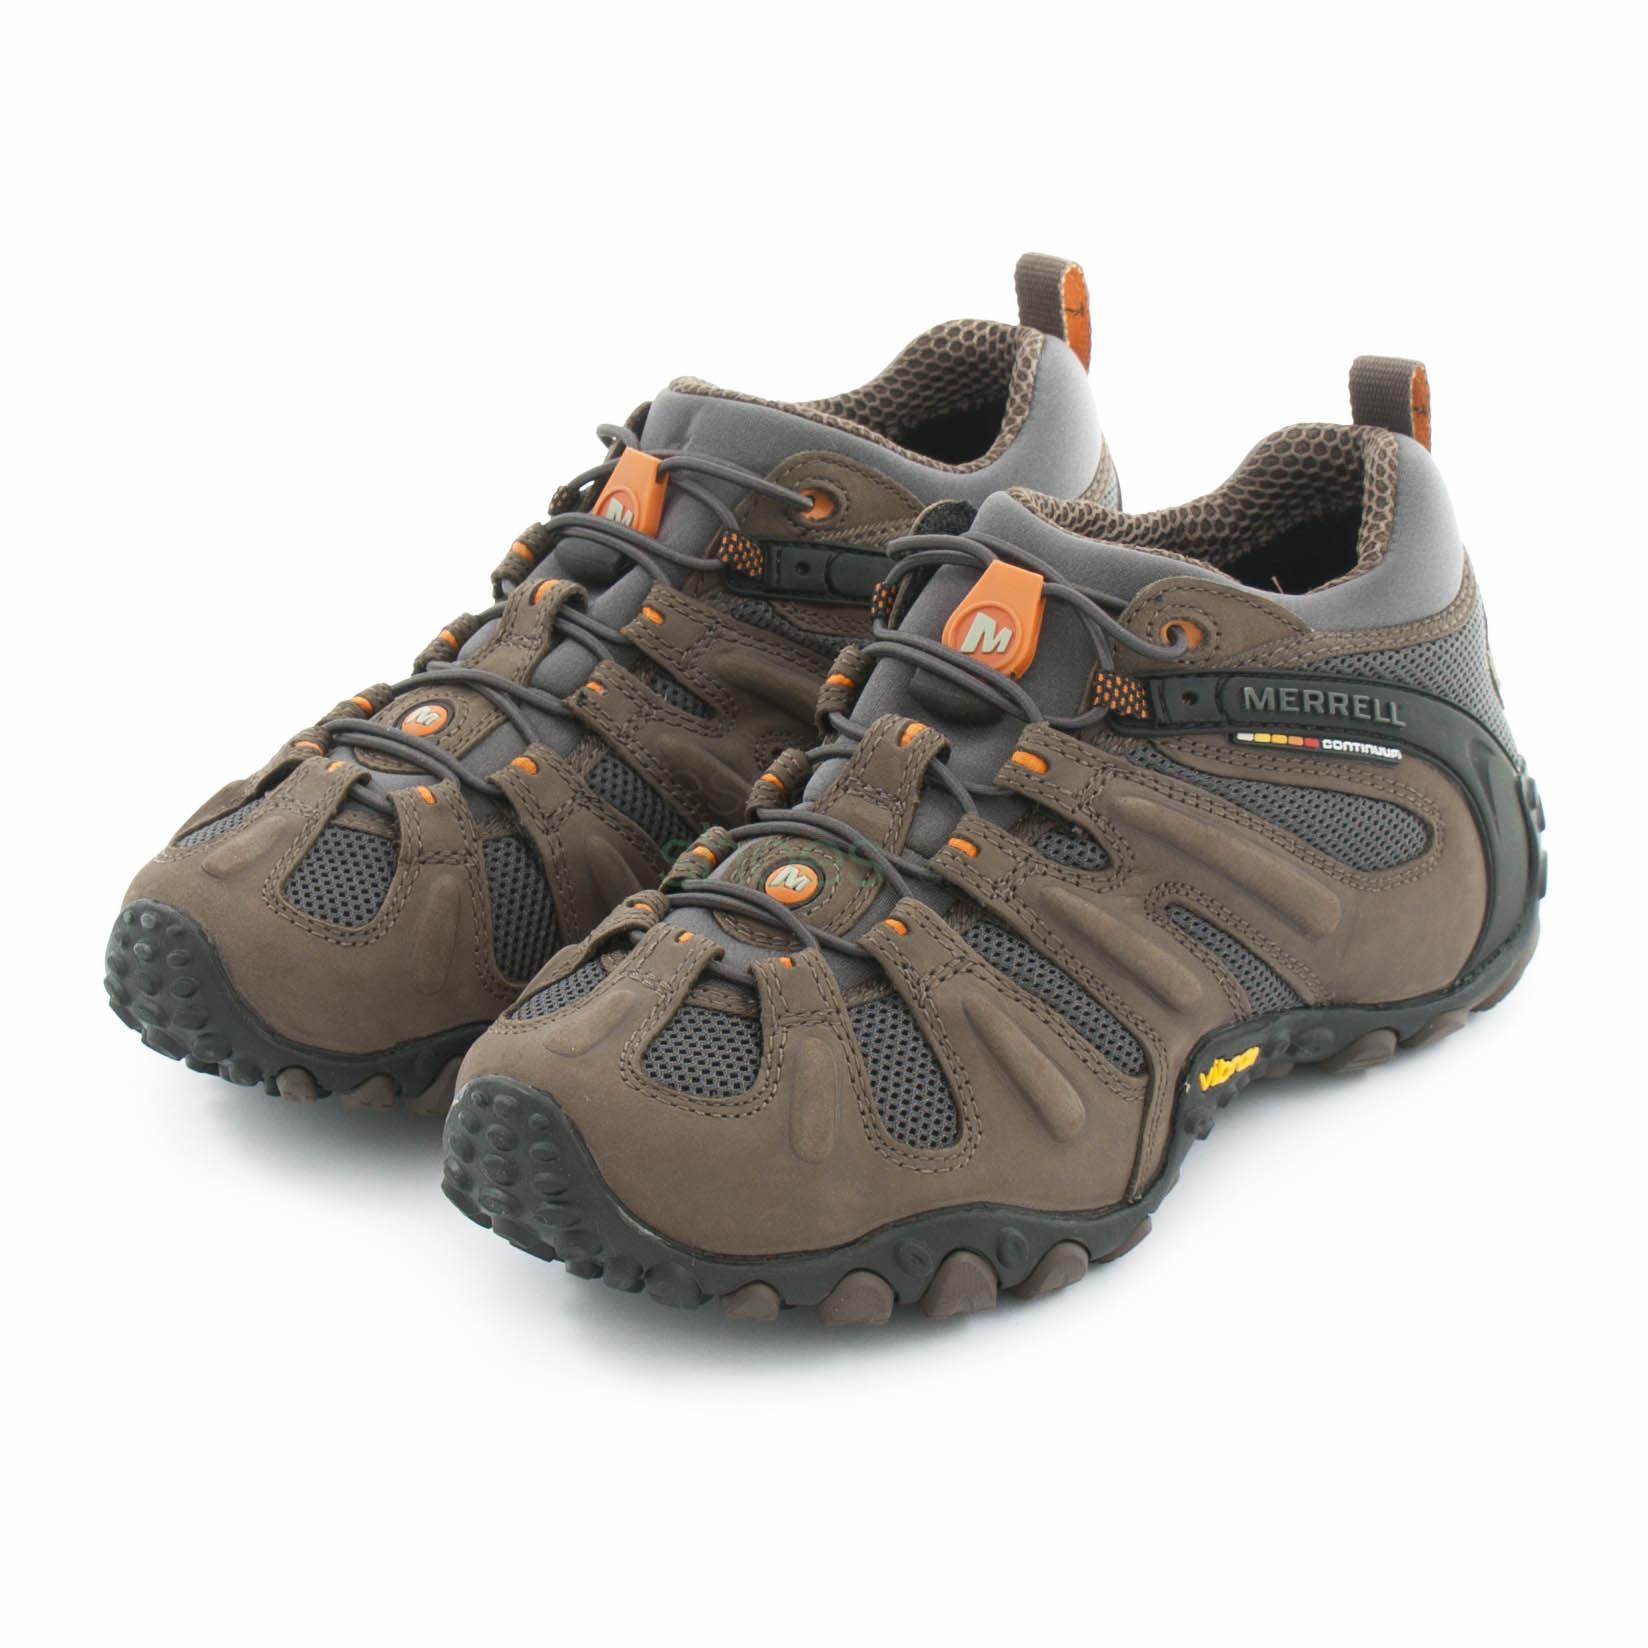 0ce3e6cef3d Buy your Sneakers MERRELL J524209 Chameleon 2 Stretch Stone Granite ...